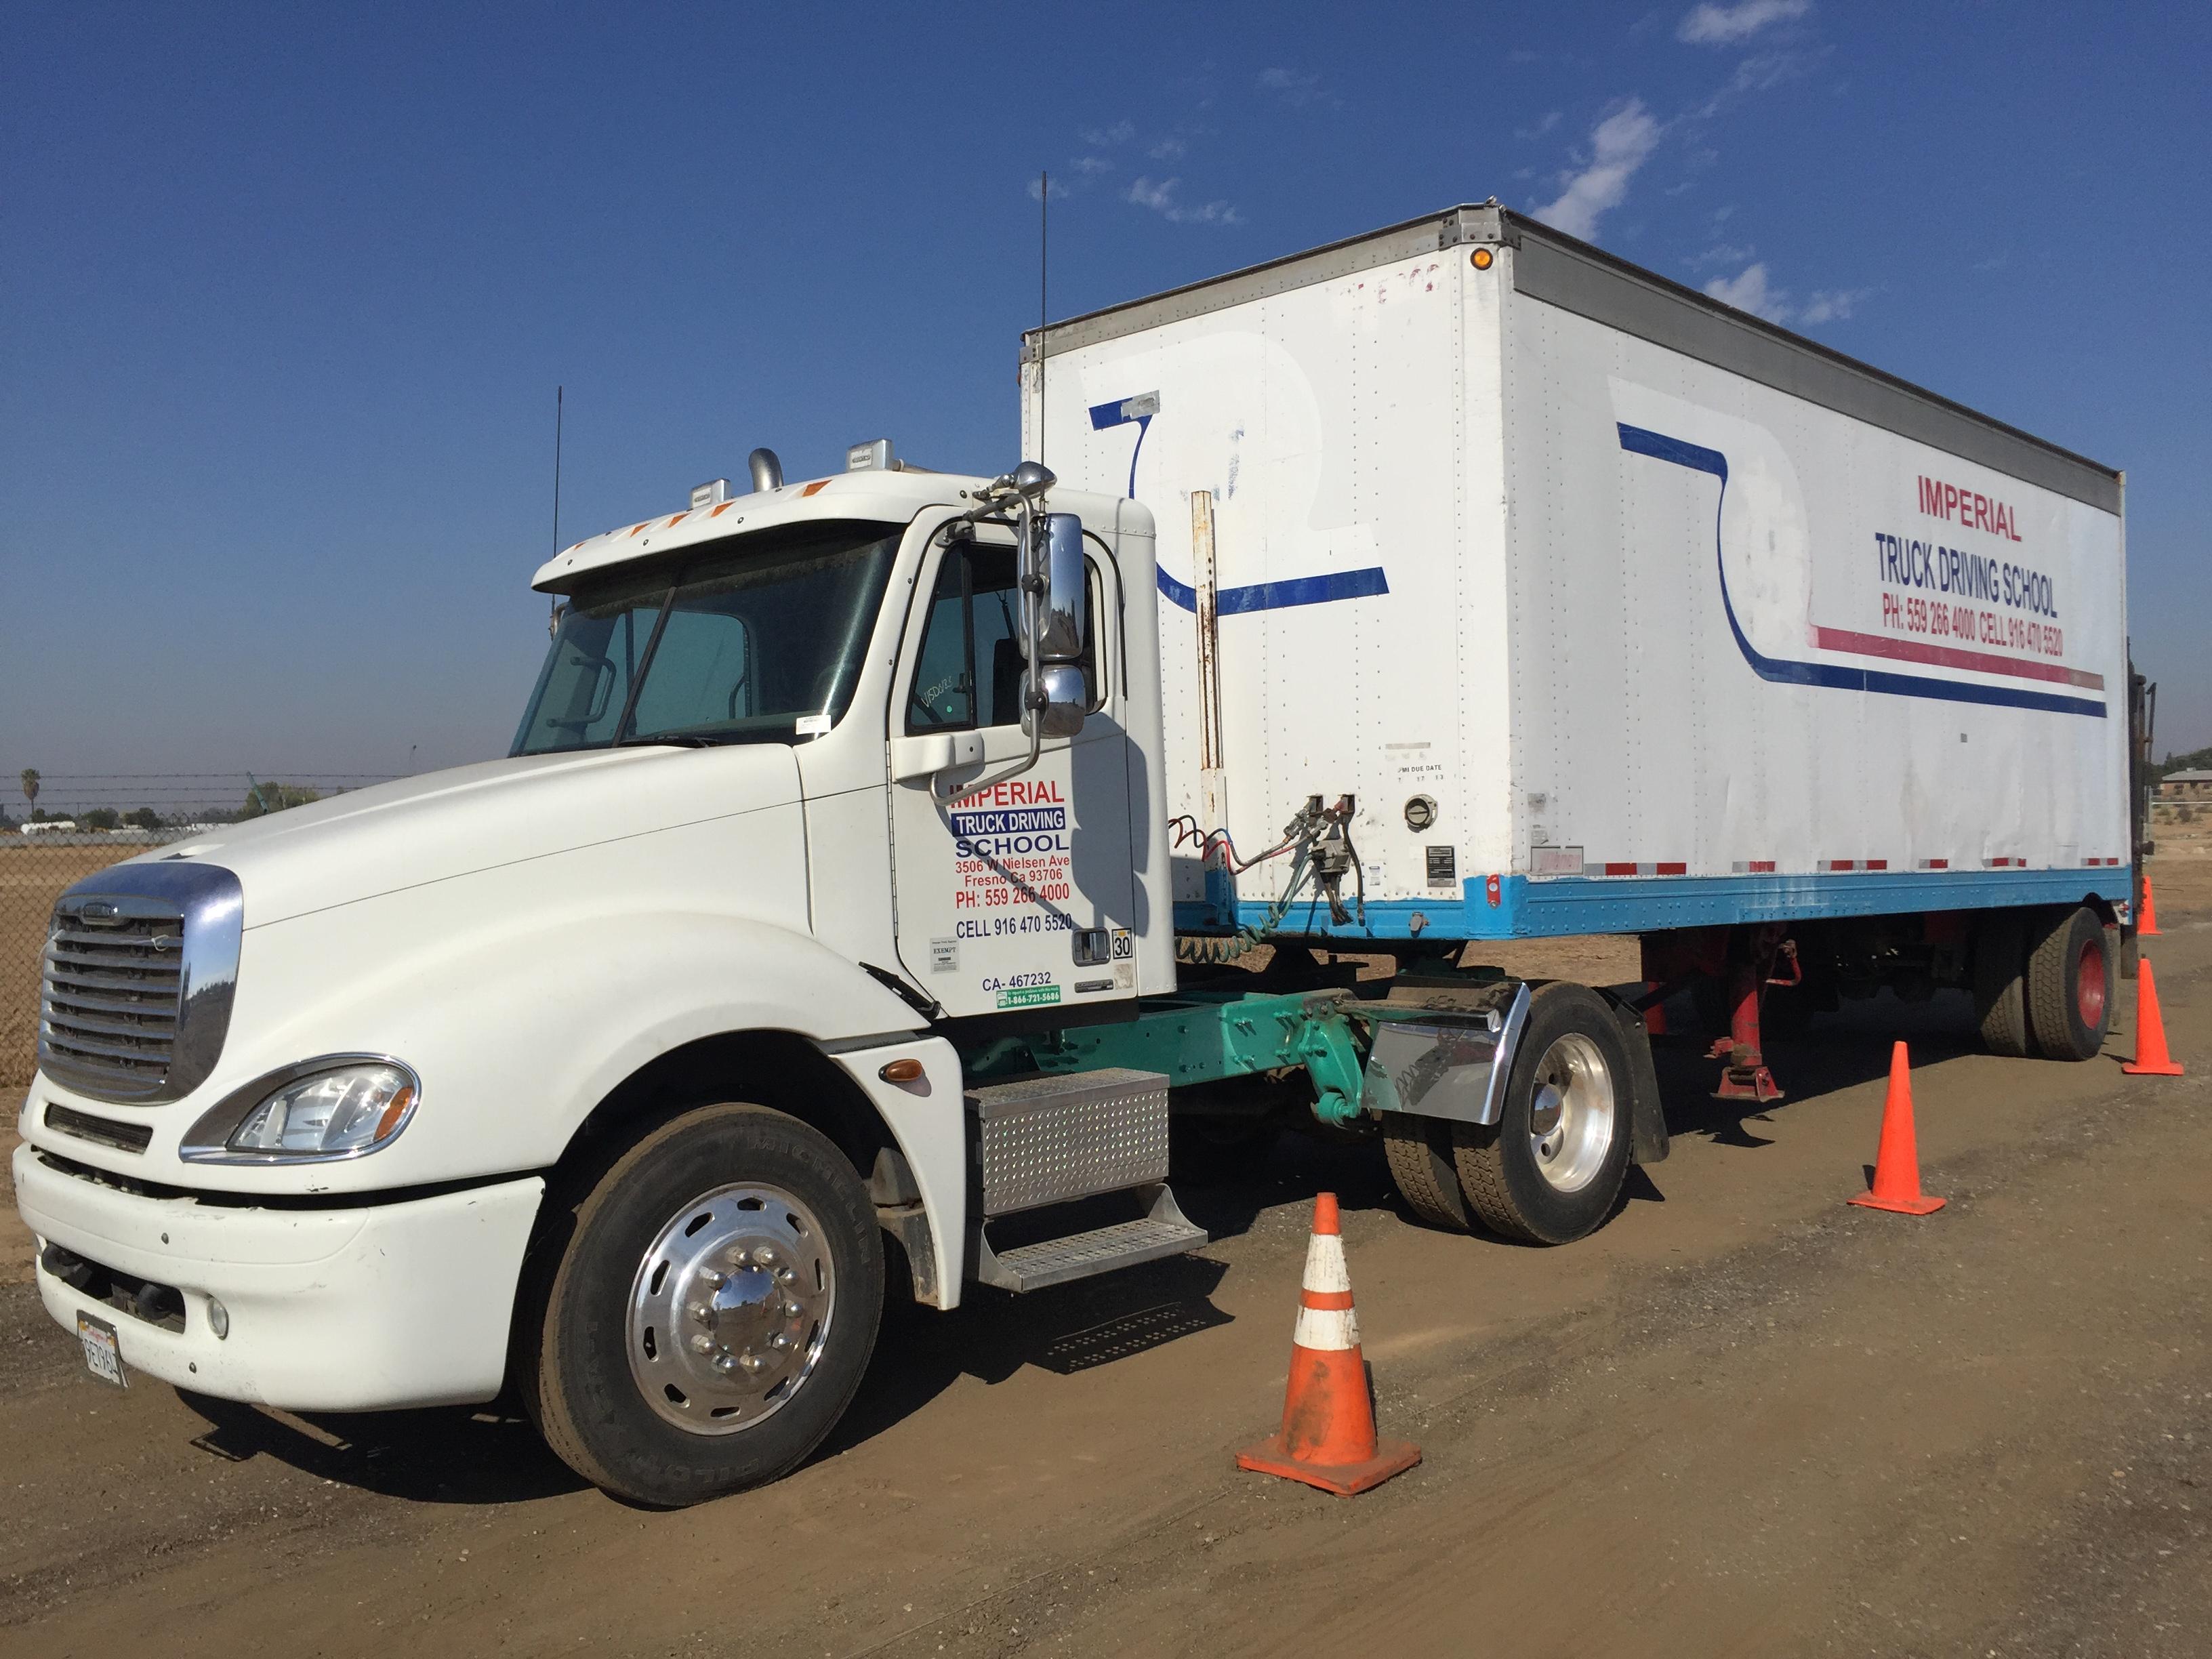 Imperial Truck Driving School 3506 W Nielsen Ave, Fresno, CA